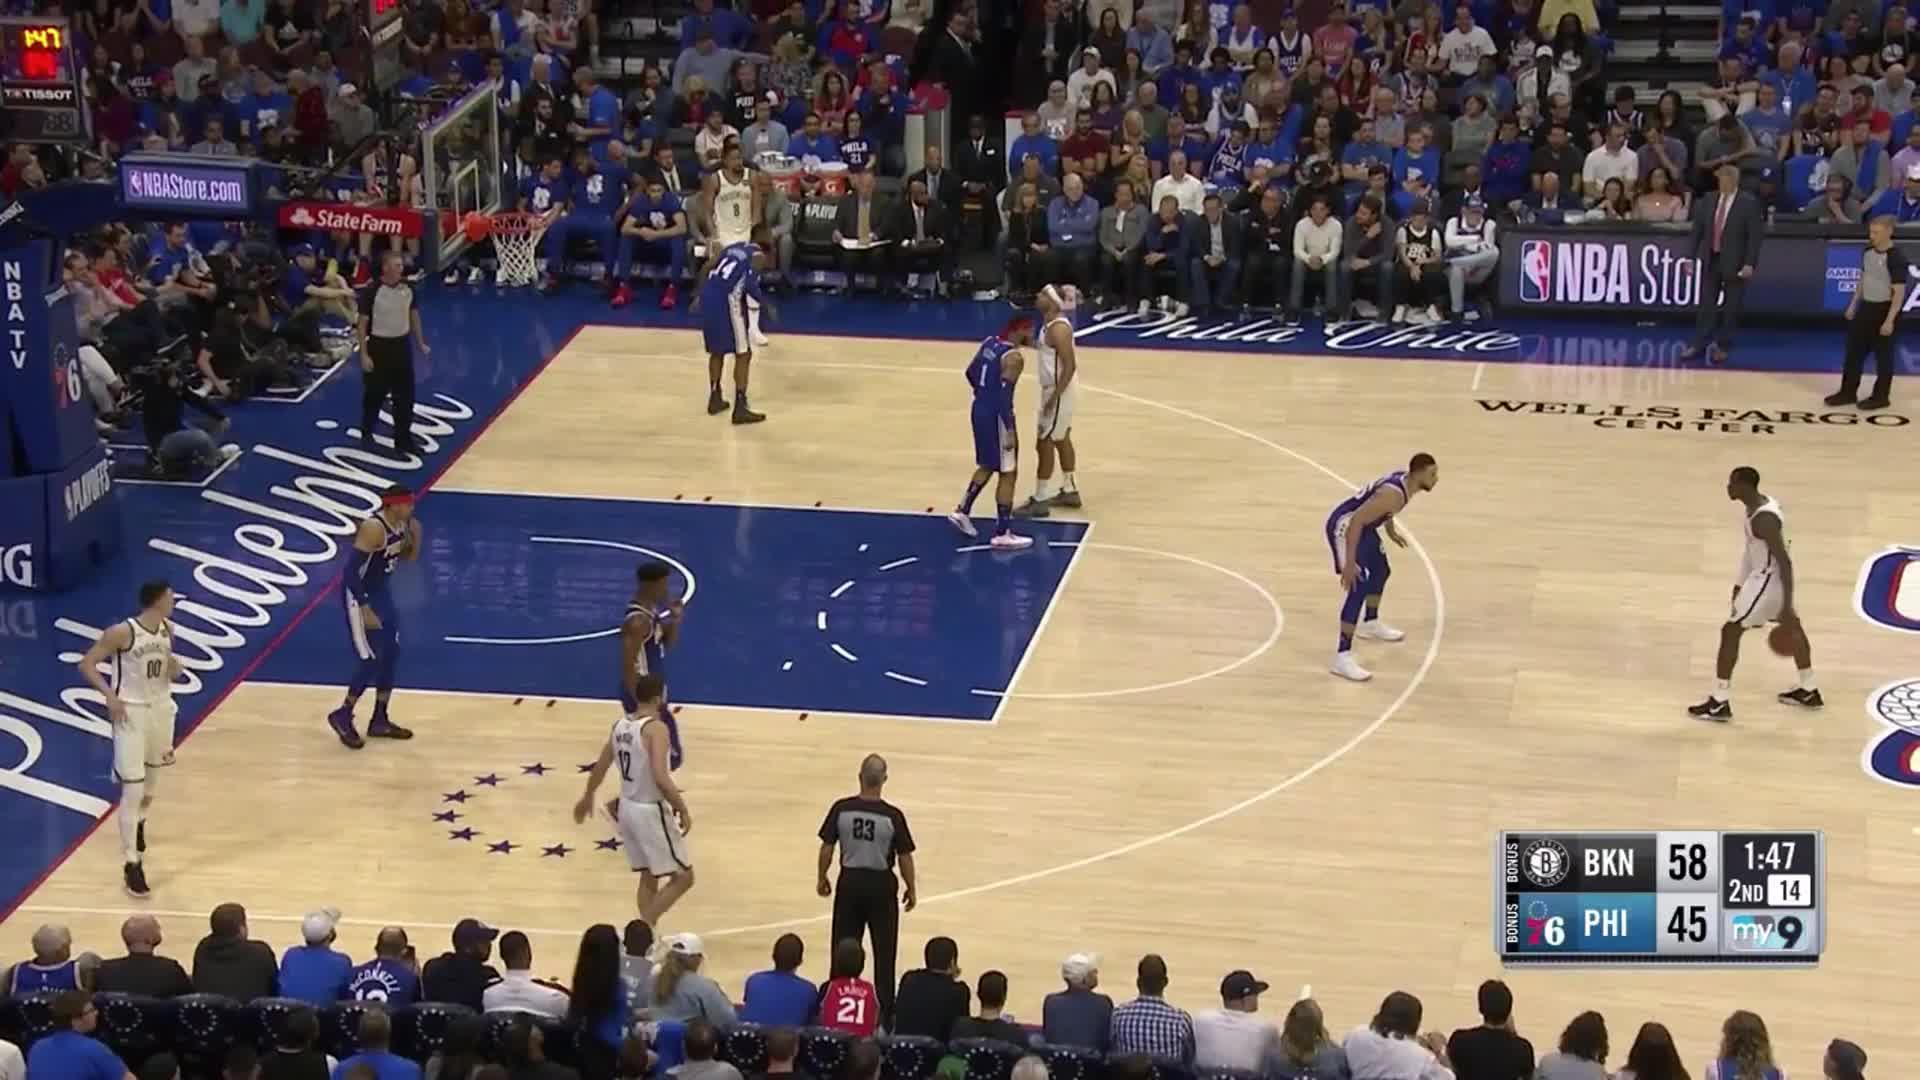 Ben Simmons, Brooklyn Nets, Philadelphia 76ers, basketball, Ben Simmons switch GIFs